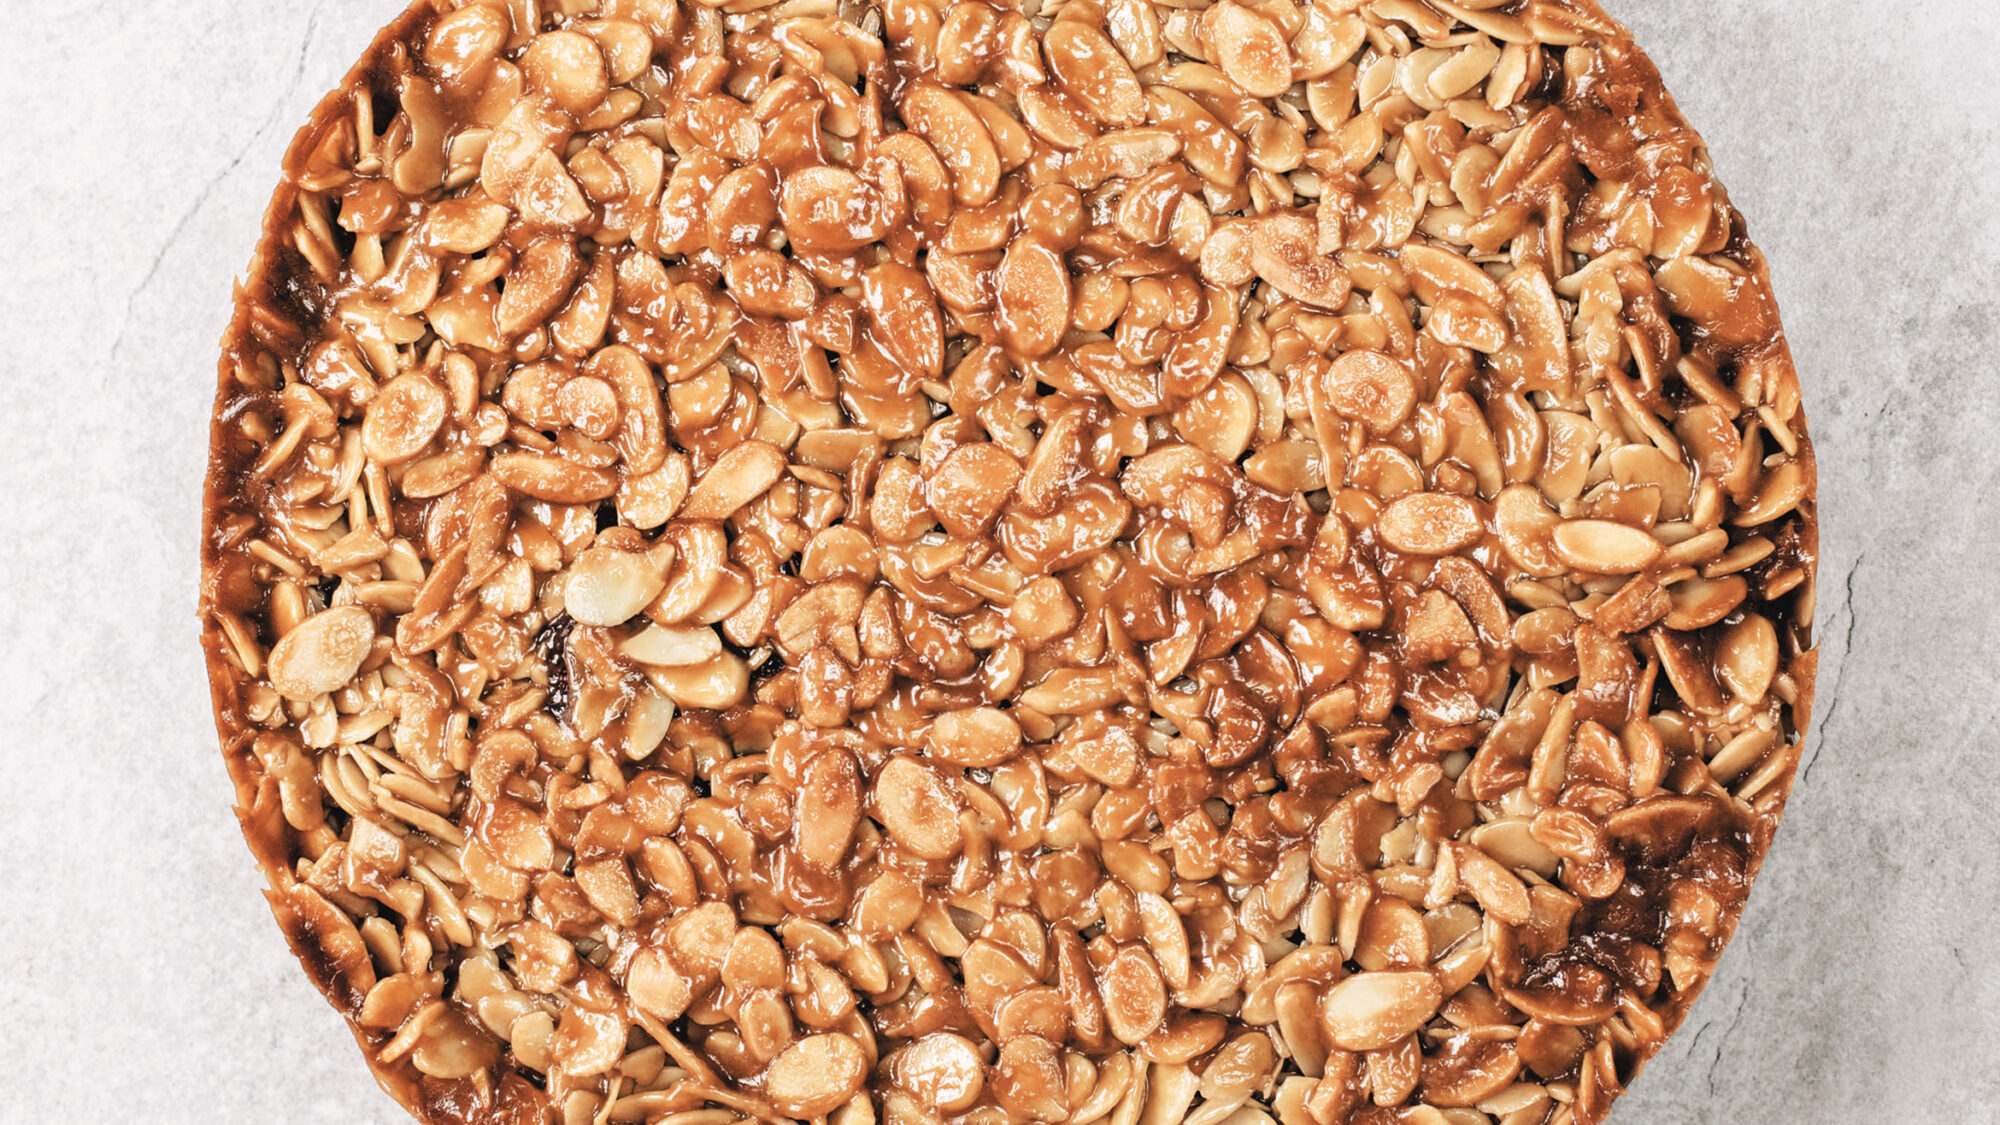 Article-Benjamina-Ebuehi-A-New-Way-to-Cake-Almond-Brittle-Cake-Recipe